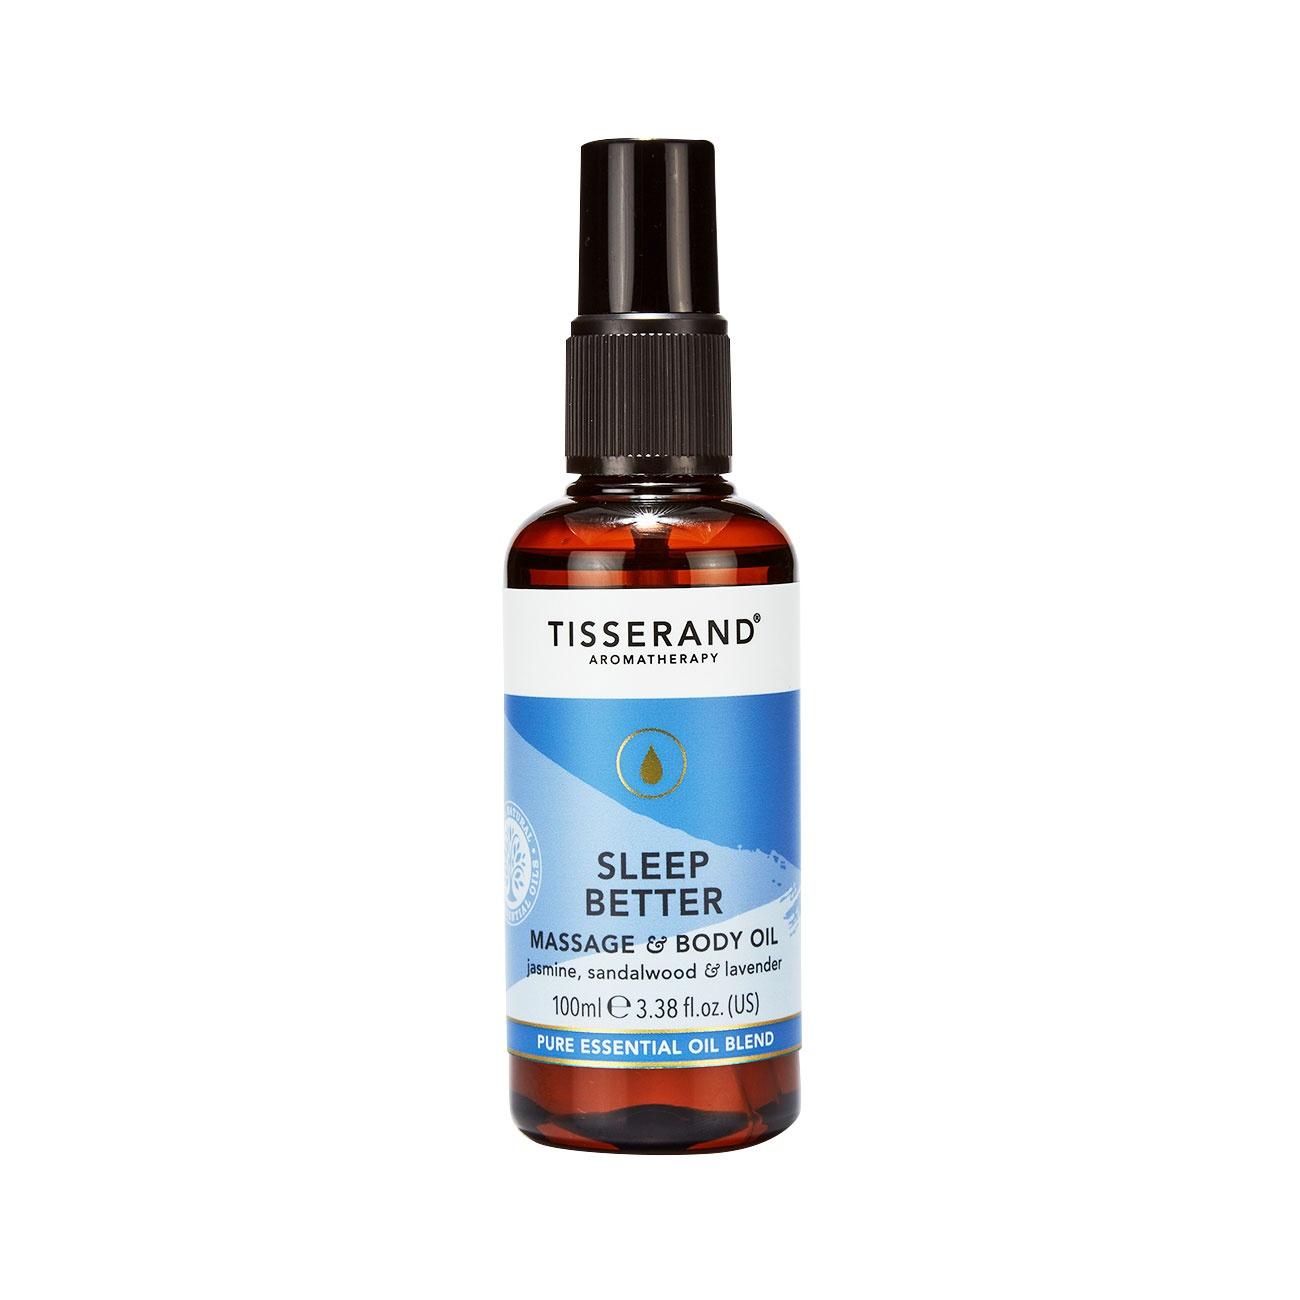 Tisserand Sleep Better Massage & Body Oil 100ml